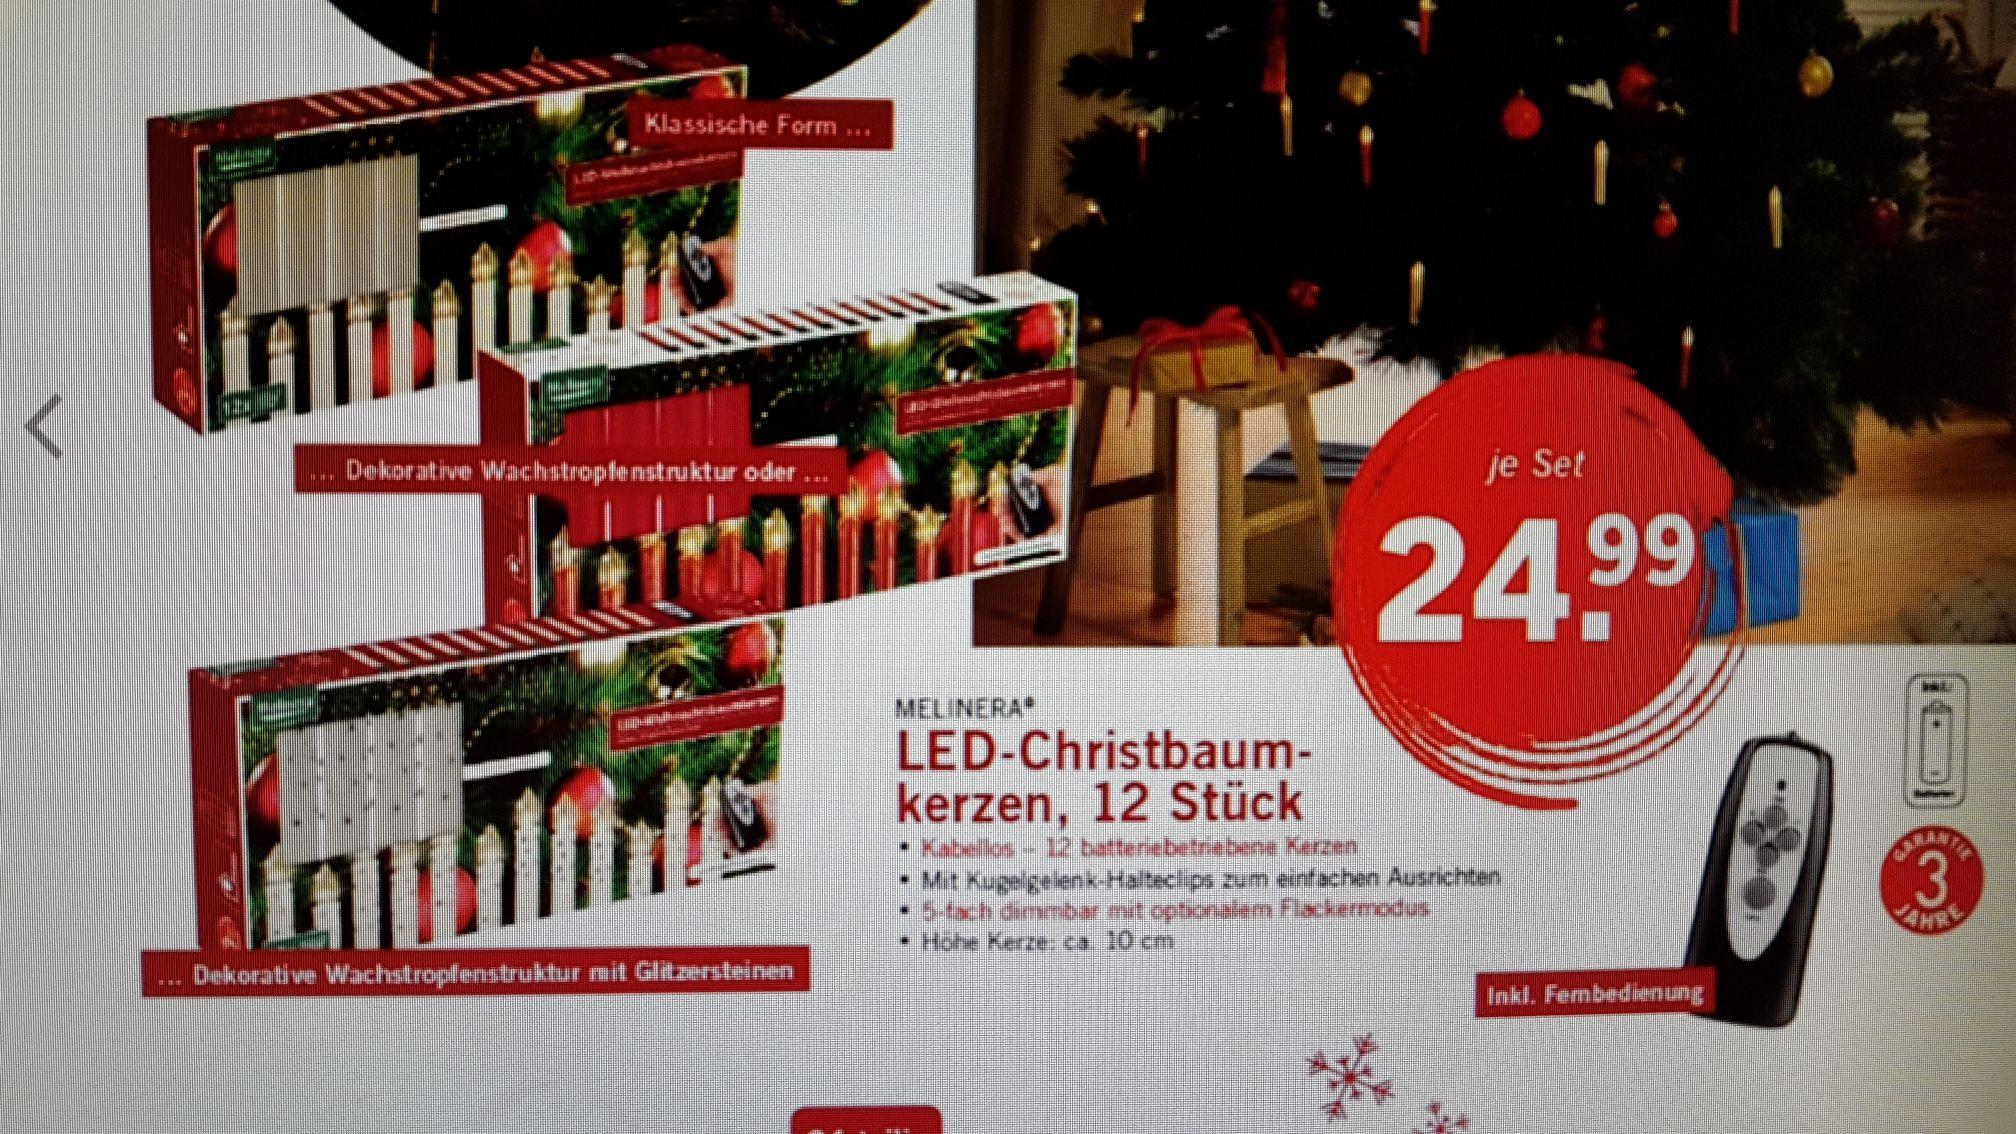 LED-Christbaumkerzen, 12 Stück bei LIDL ab 13.11.2017